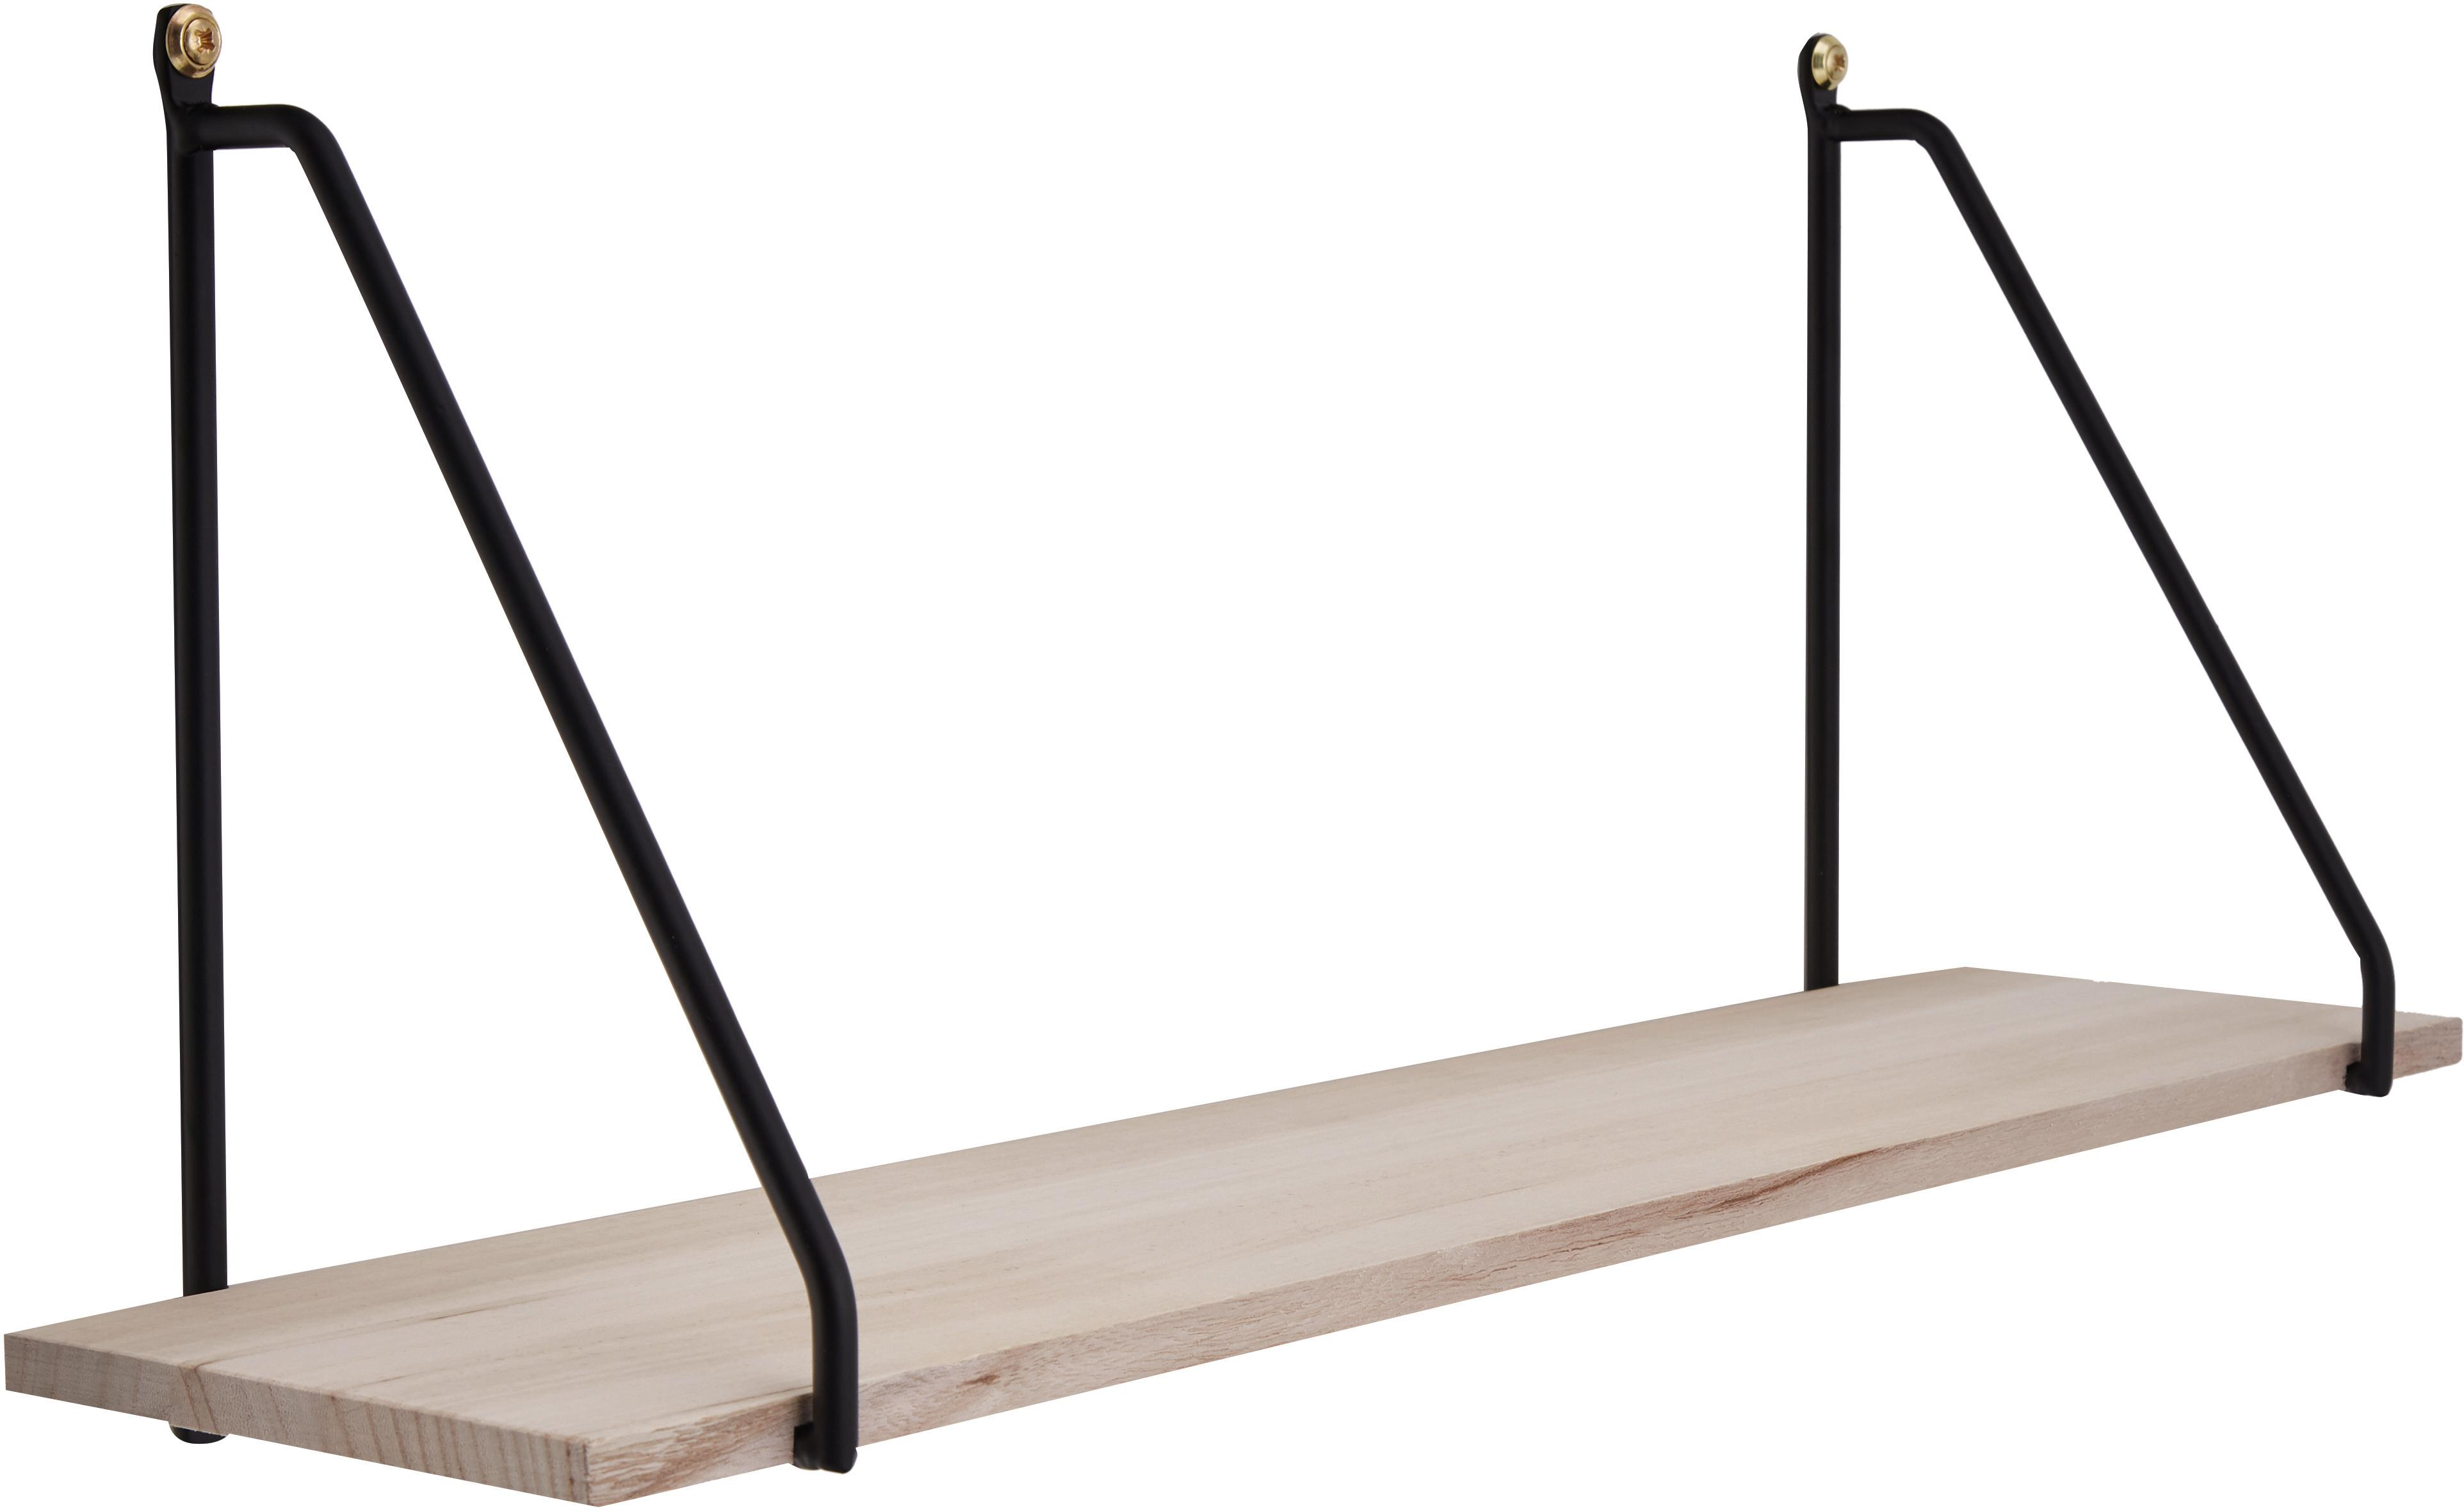 Wandrek Arnhem van metaal en hout, Frame: gepoedercoat metaal, Plank: hout, Zwart, houtkleurig, 65 x 27 cm